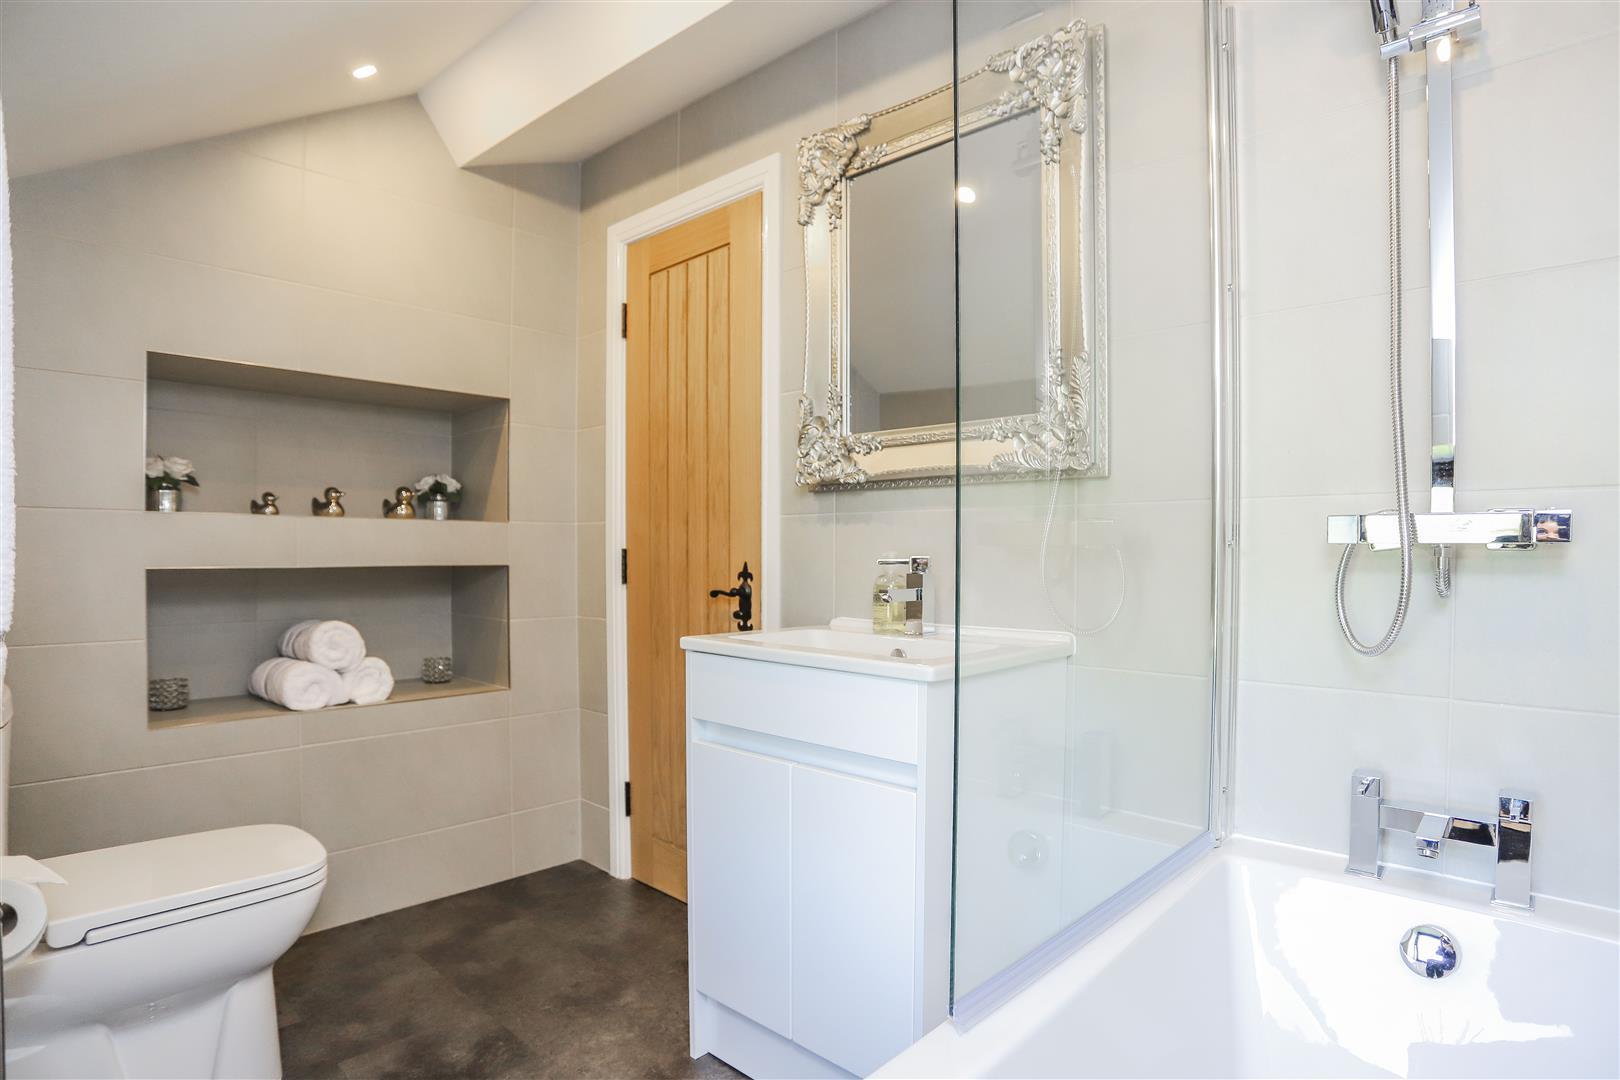 4 Bedroom Semi-detached House For Sale - 39.JPG